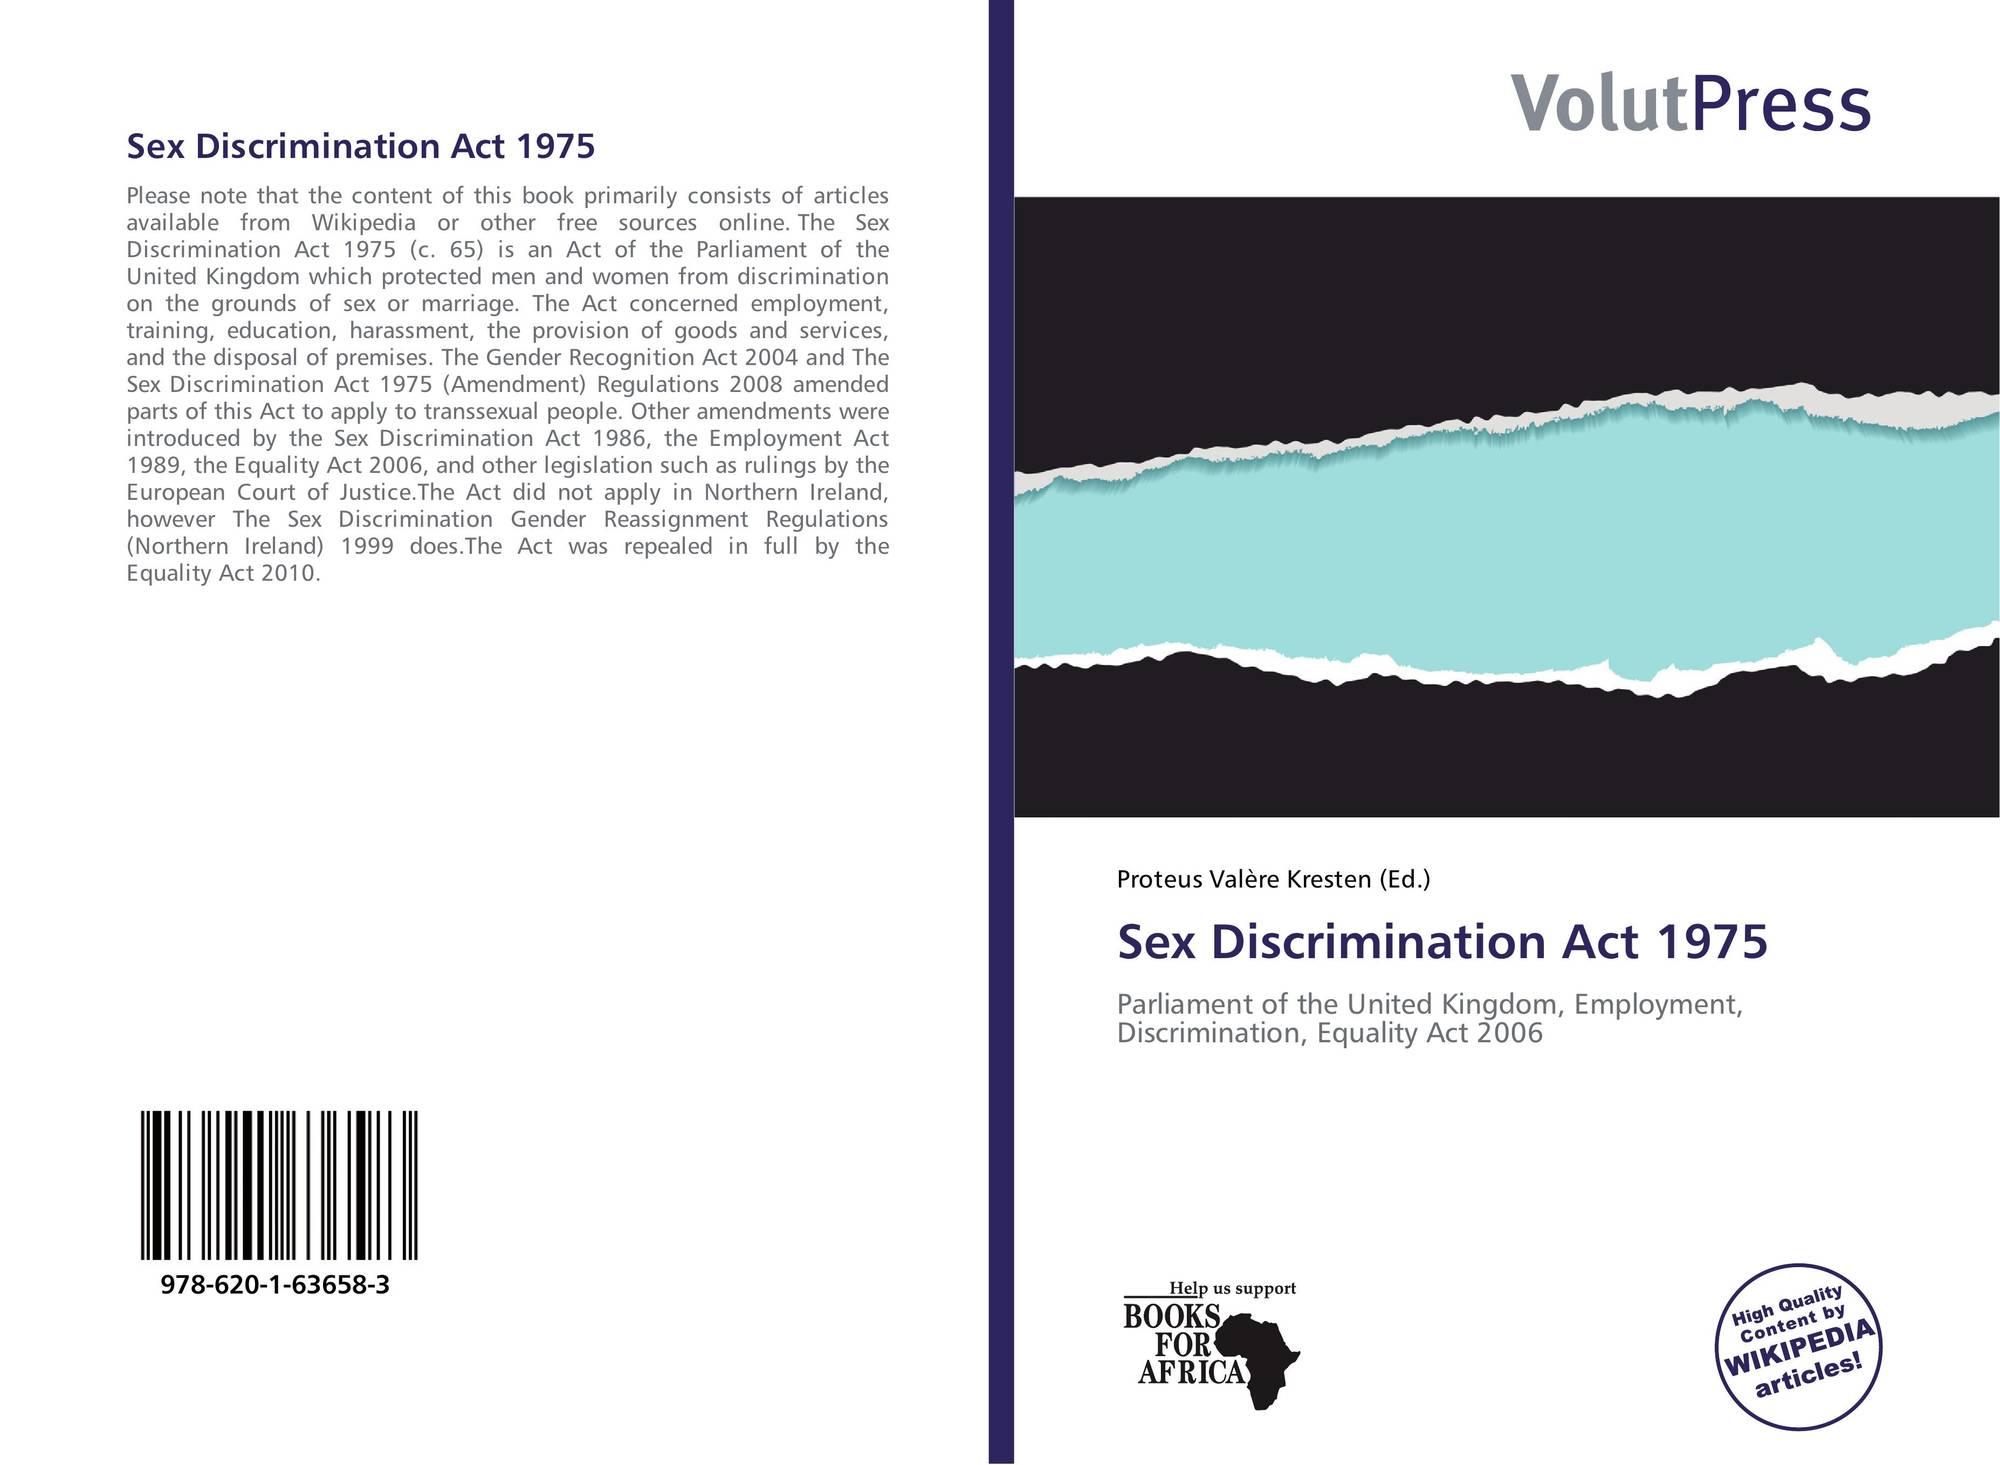 sex discrimination act in 1975